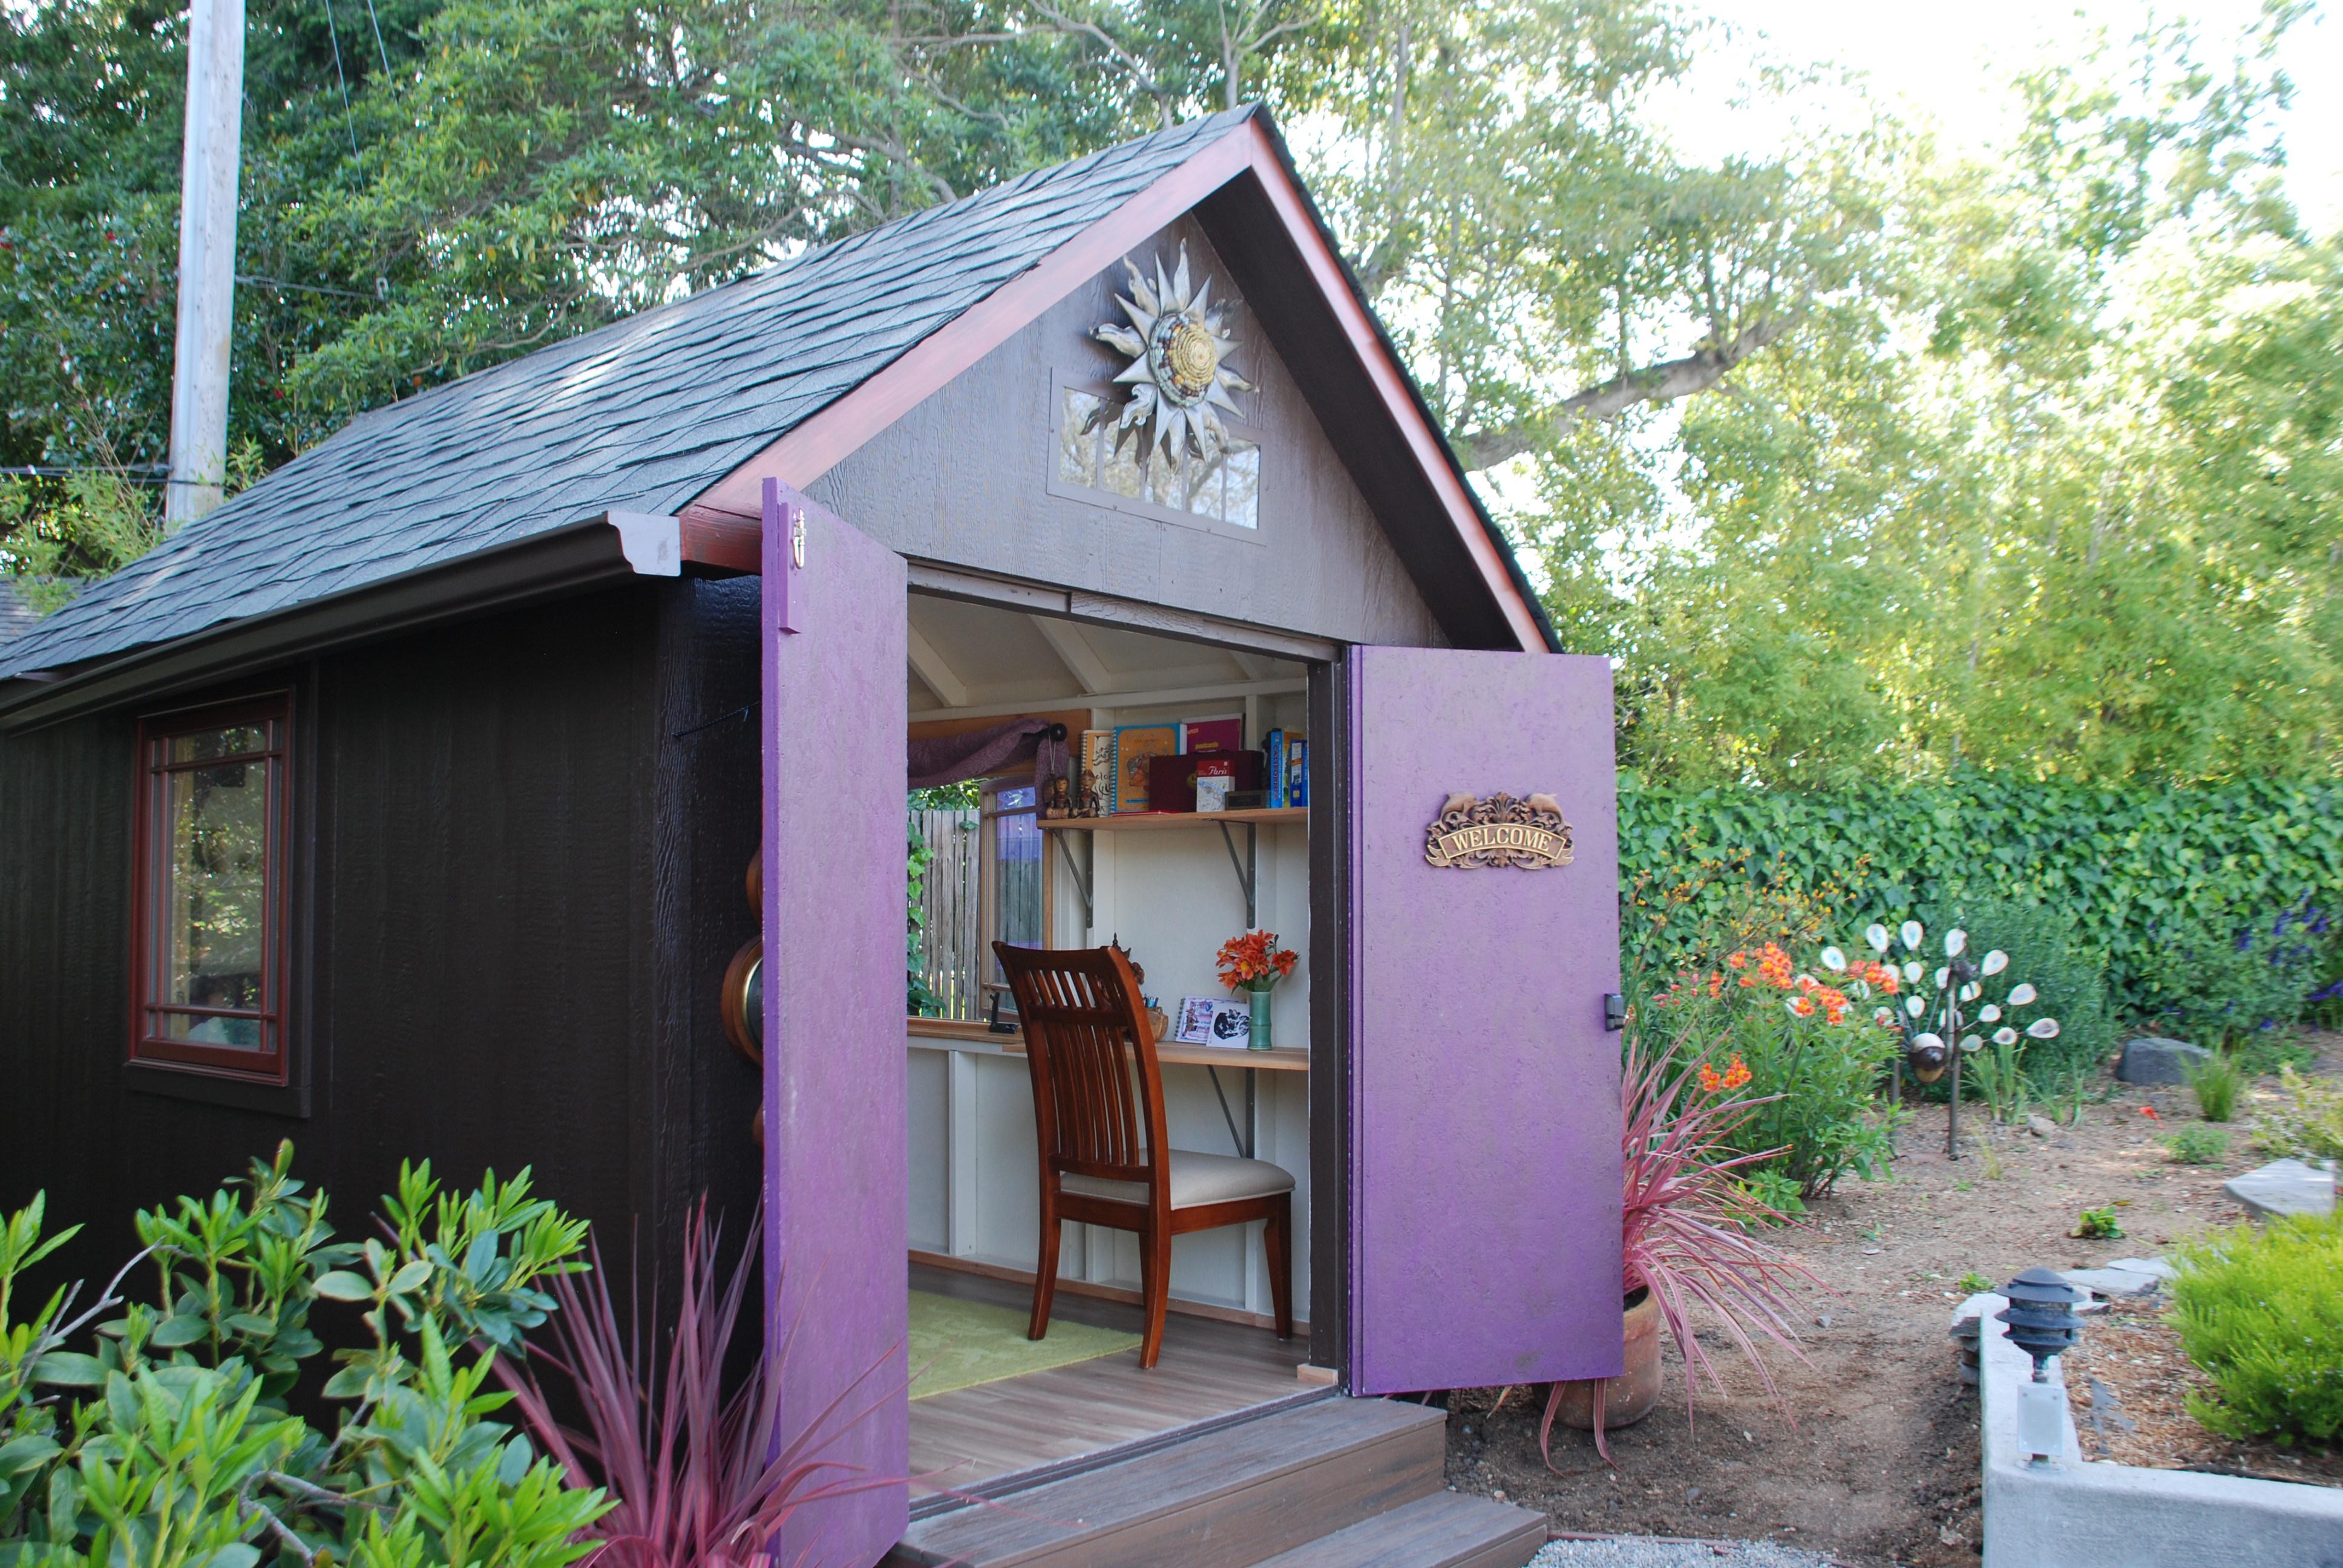 A backyard she shed with a home office inside.